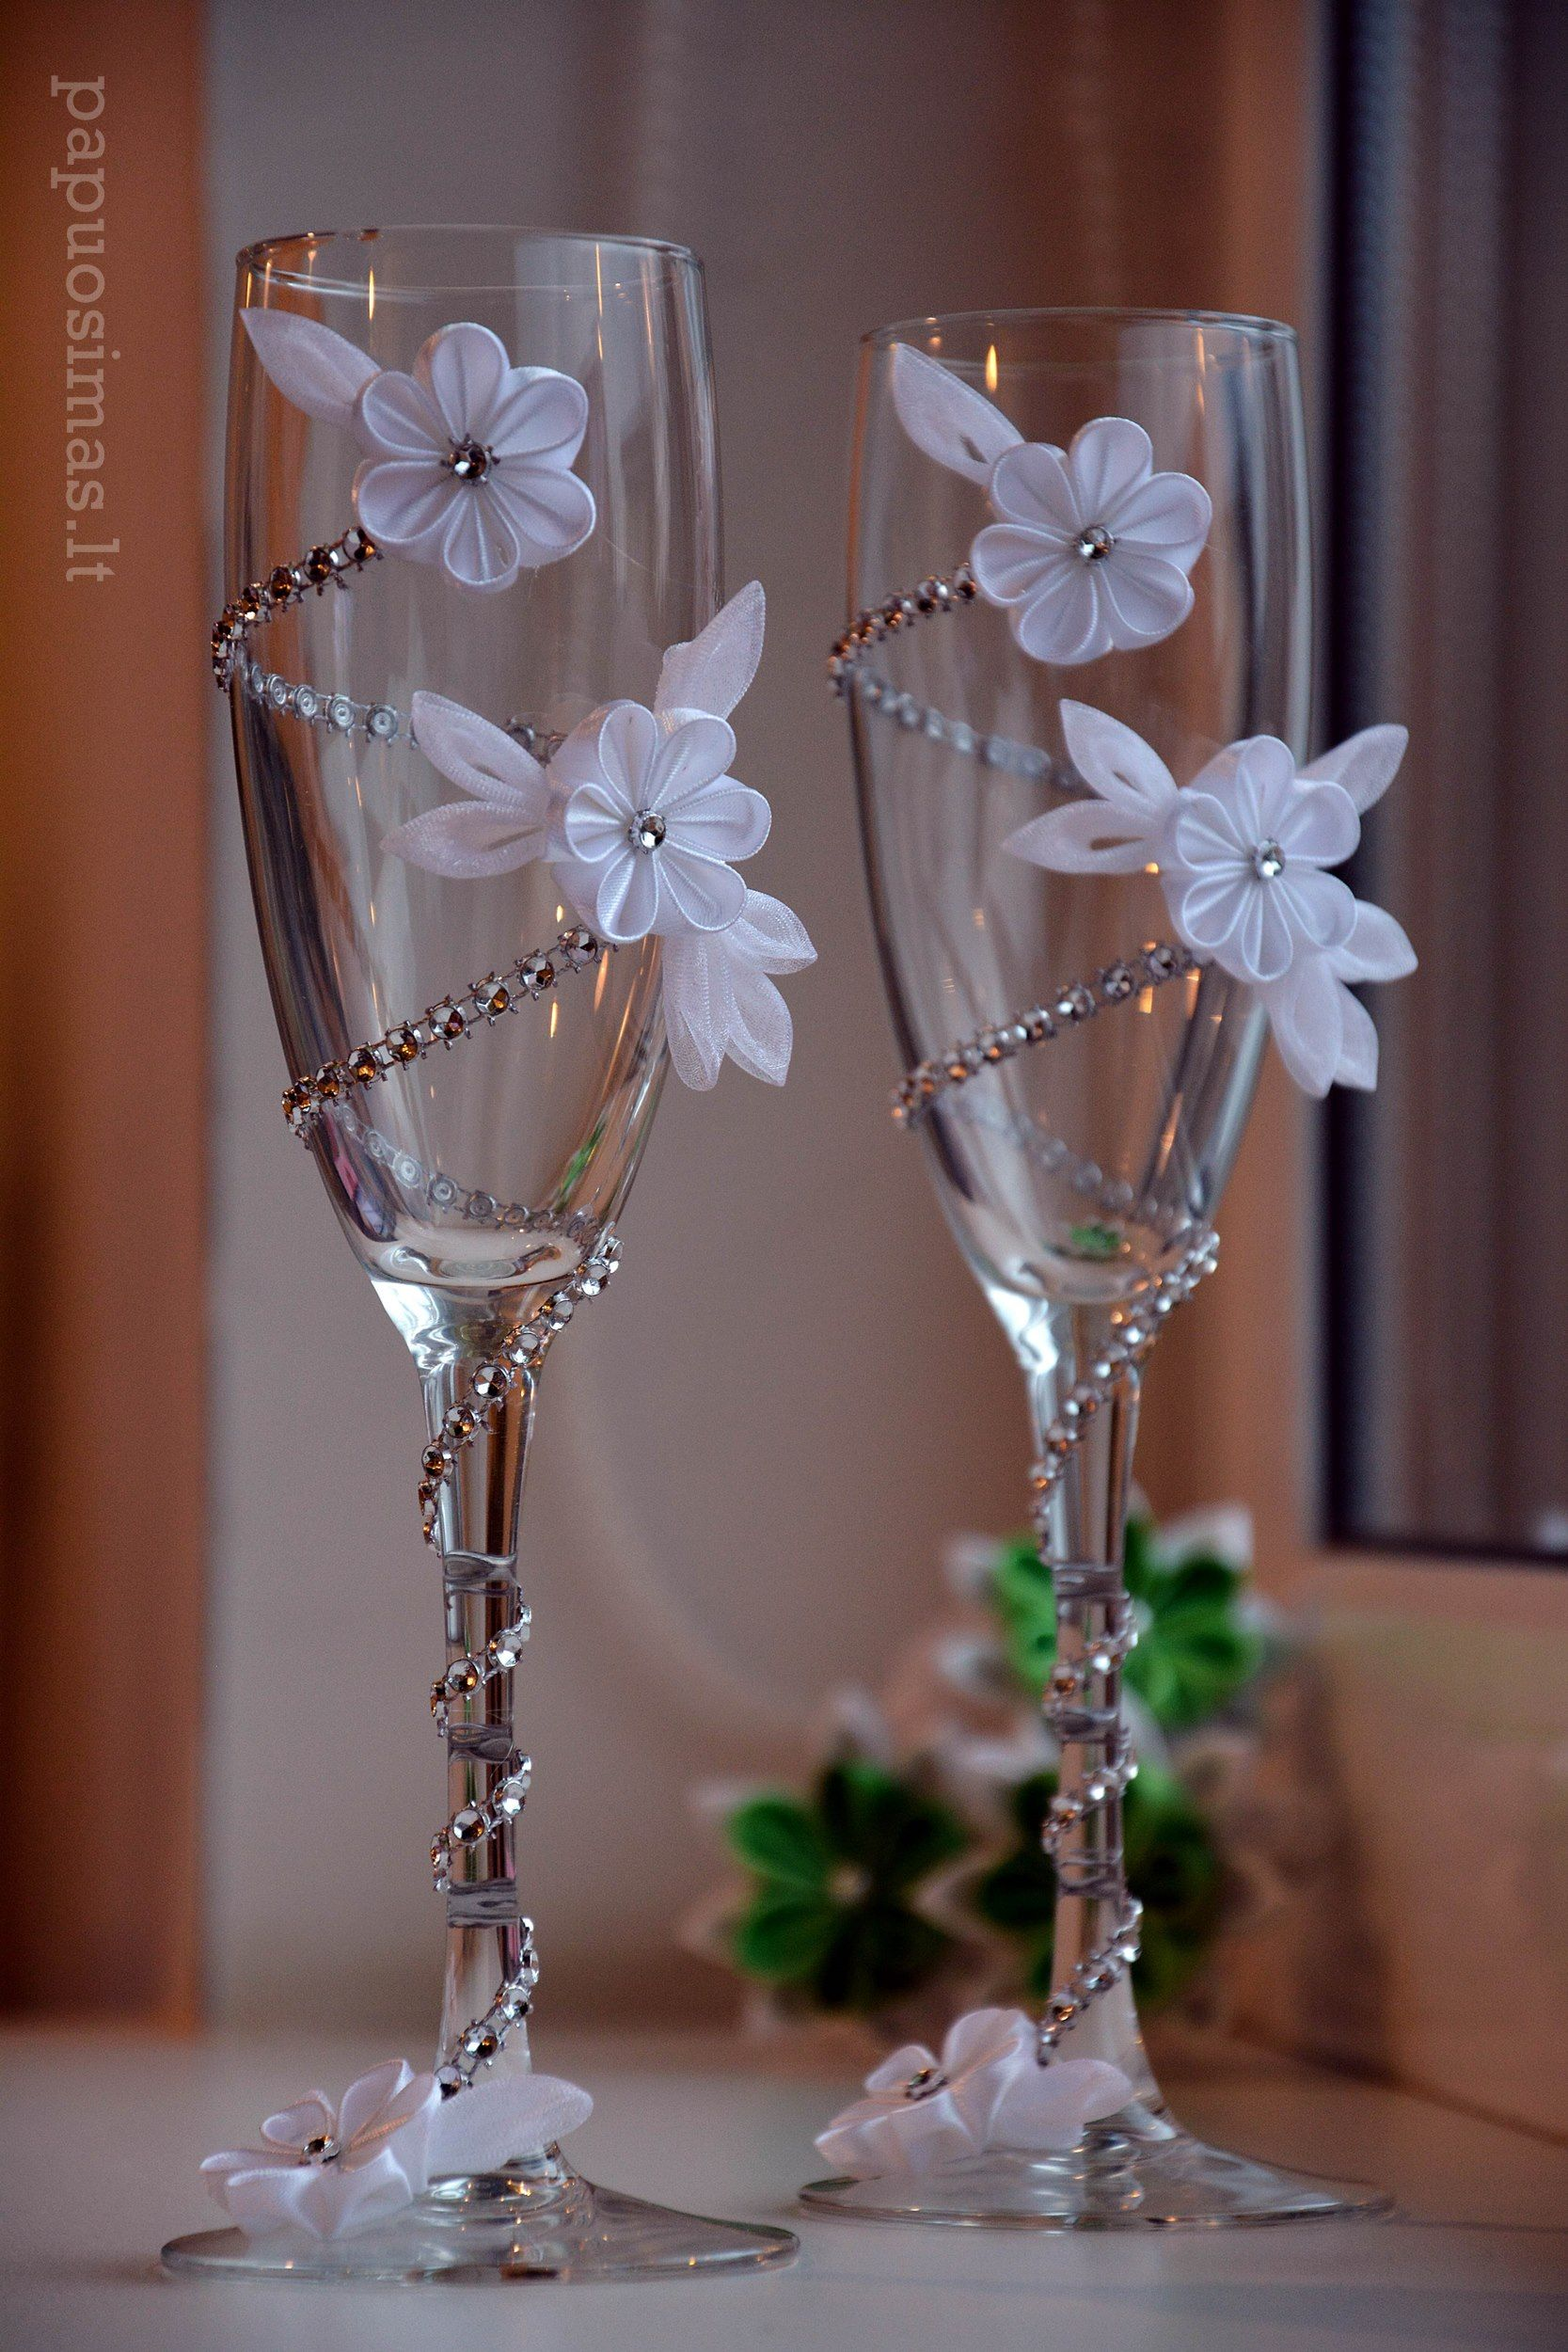 best 25 copas decoradas ideas on pinterest copas decoradas para novios brindis con champ n. Black Bedroom Furniture Sets. Home Design Ideas